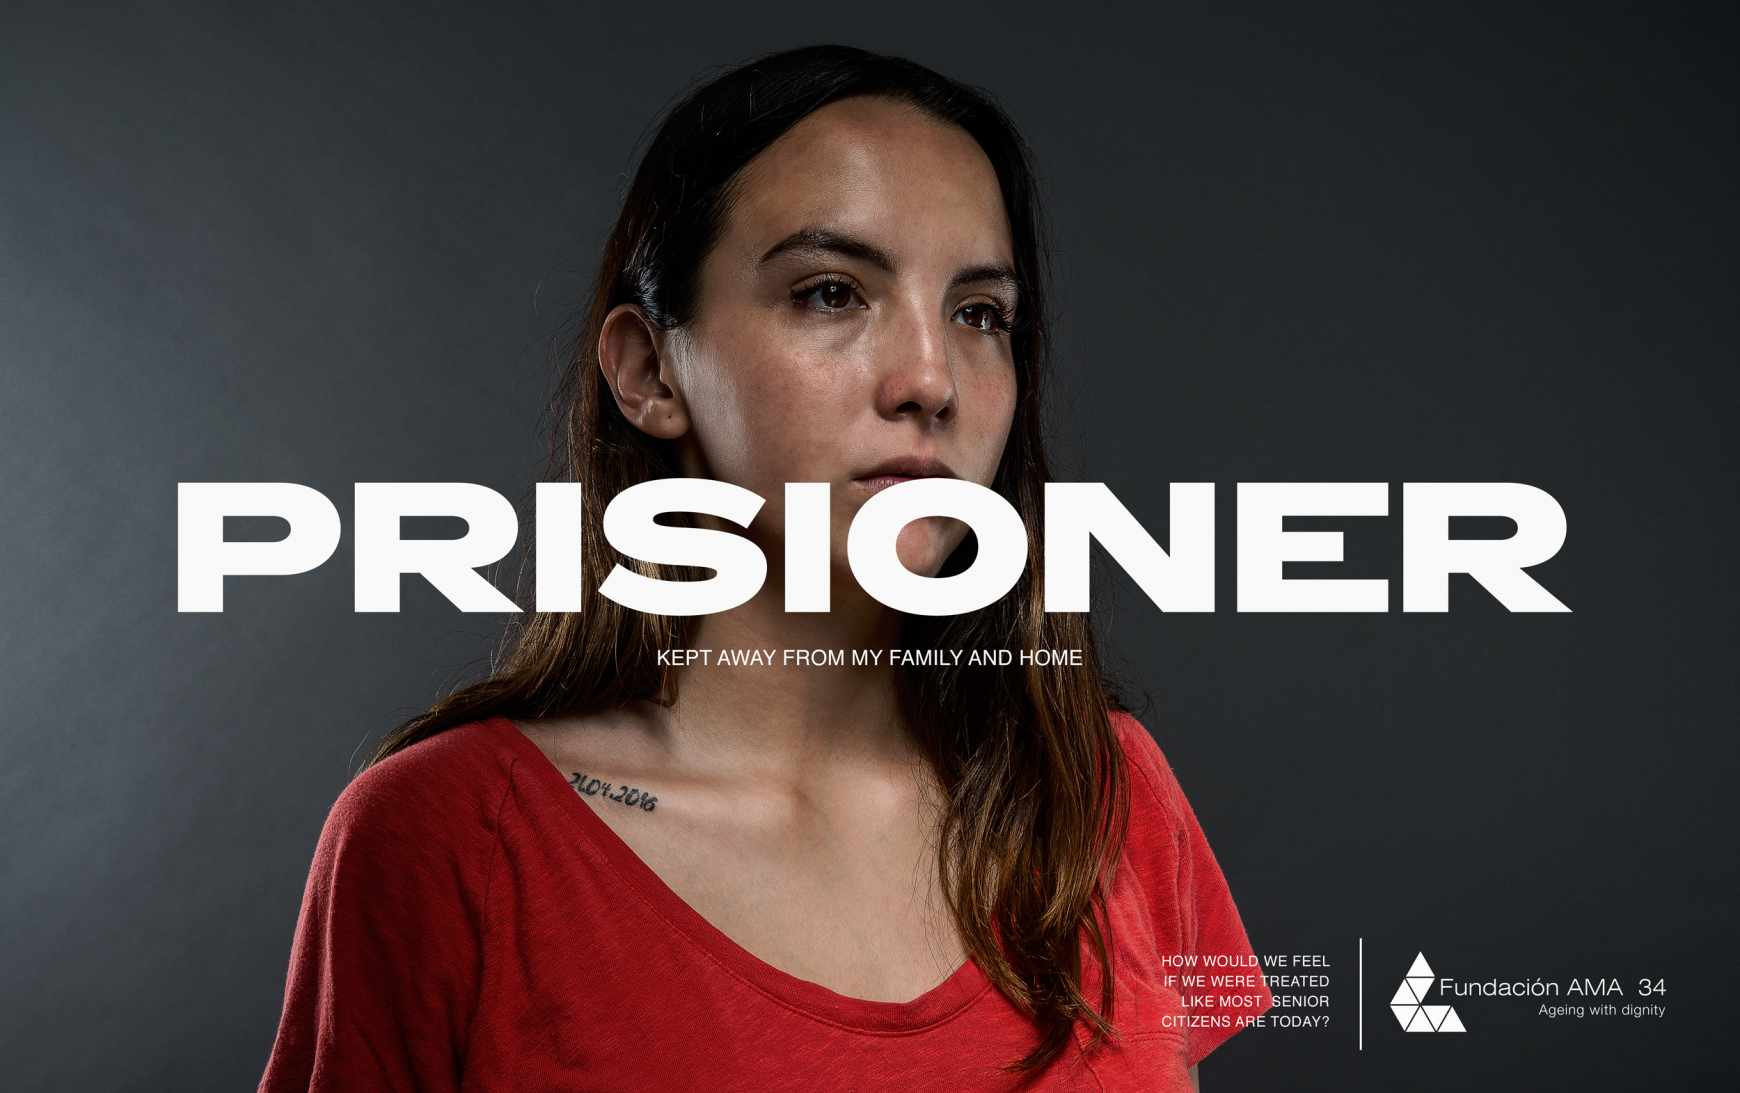 AMA 34 Foundation Print Ad - Prisioner